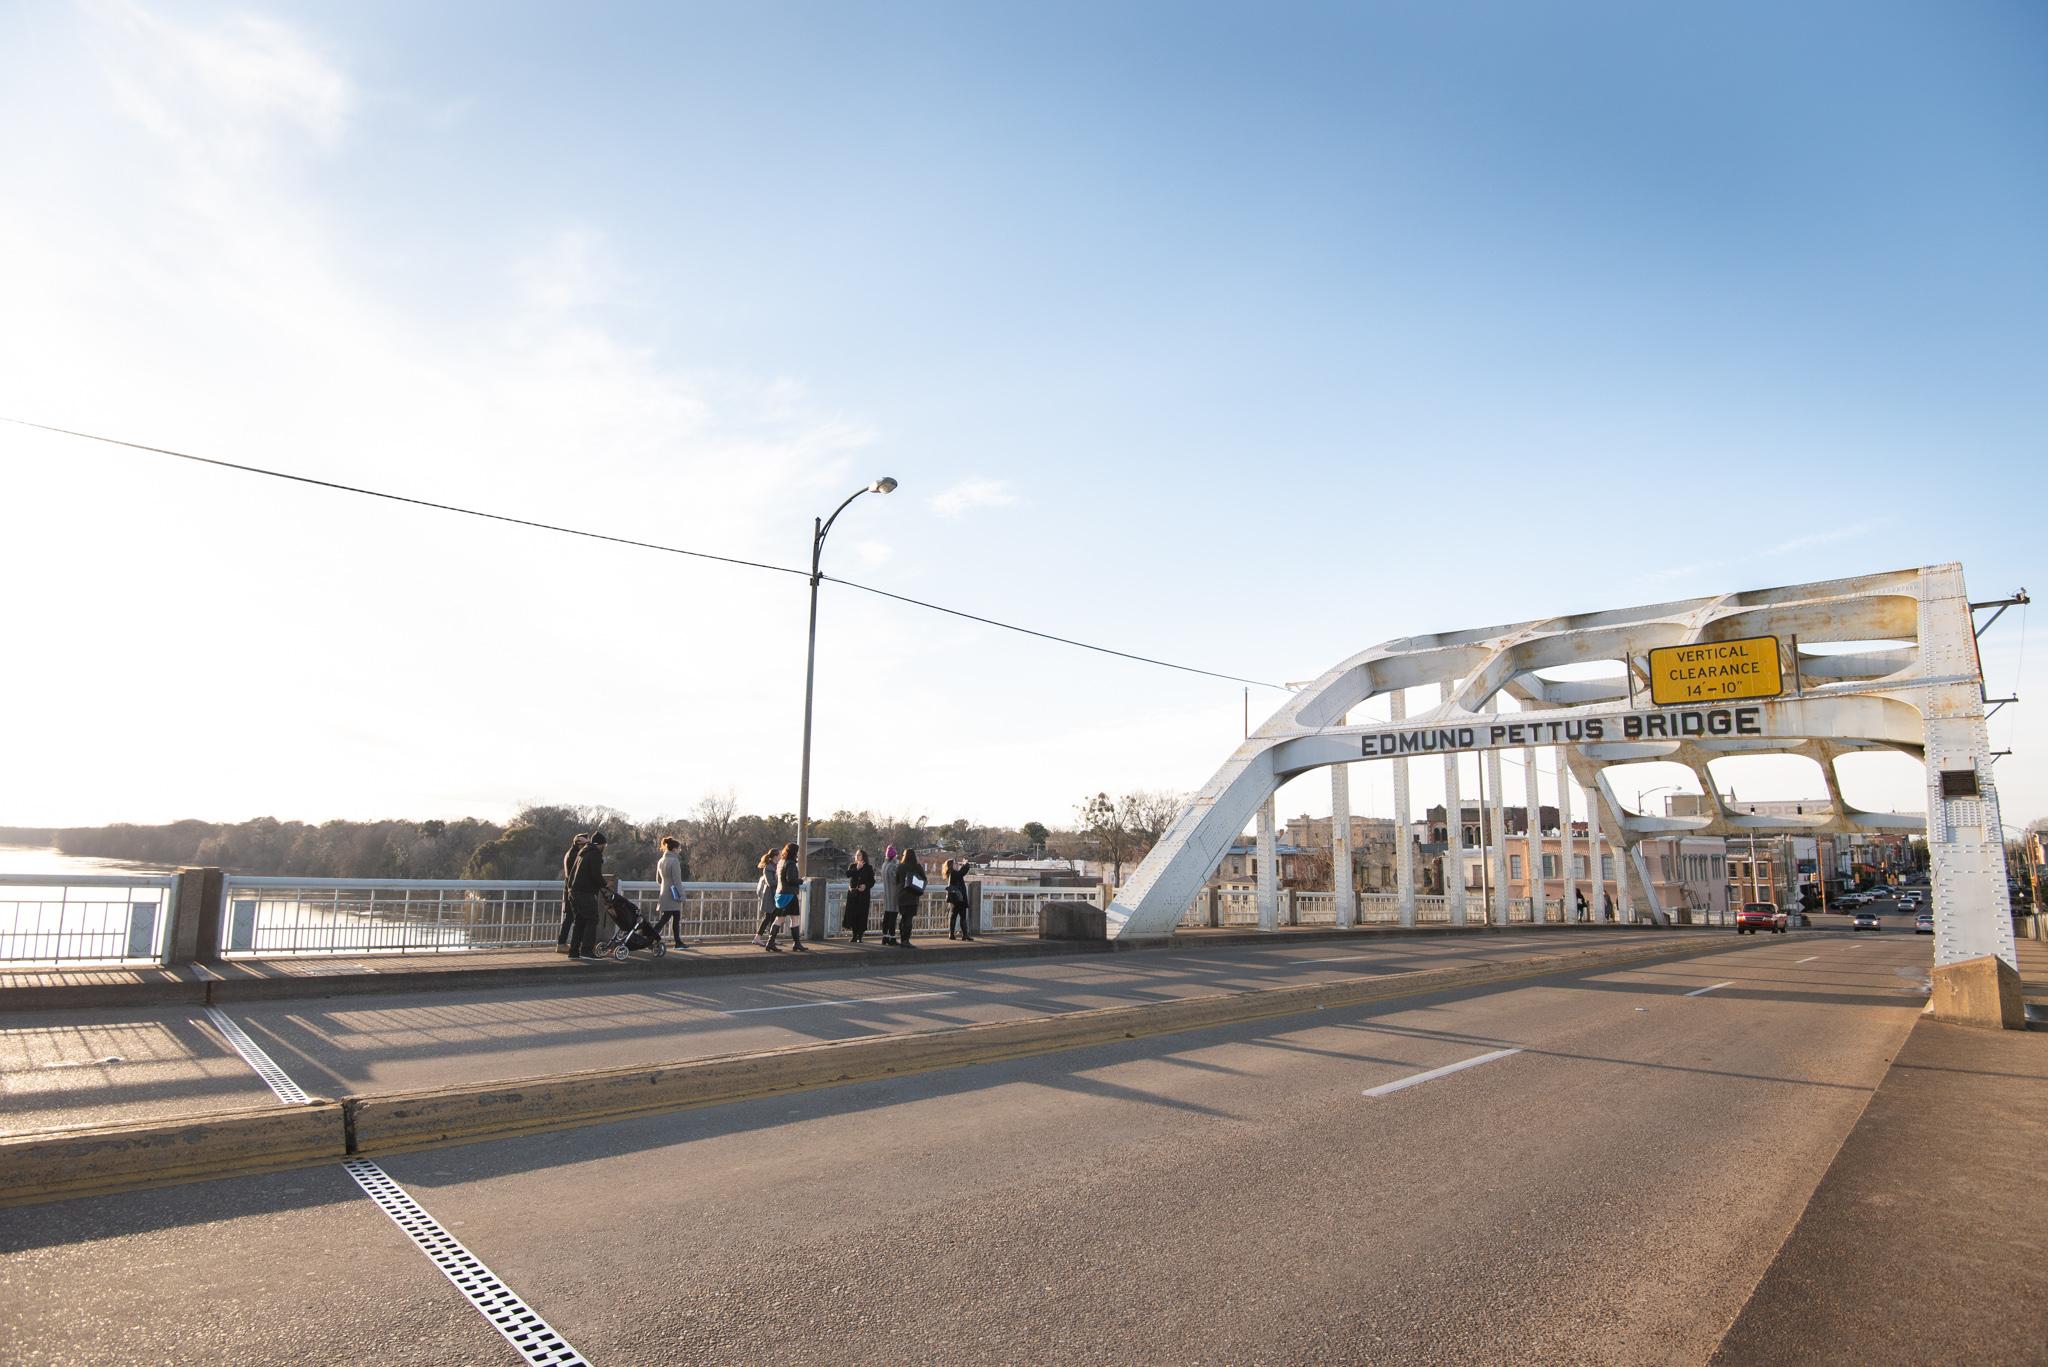 Edmund Pettus Bridge_Wide Angle Shot.jpg